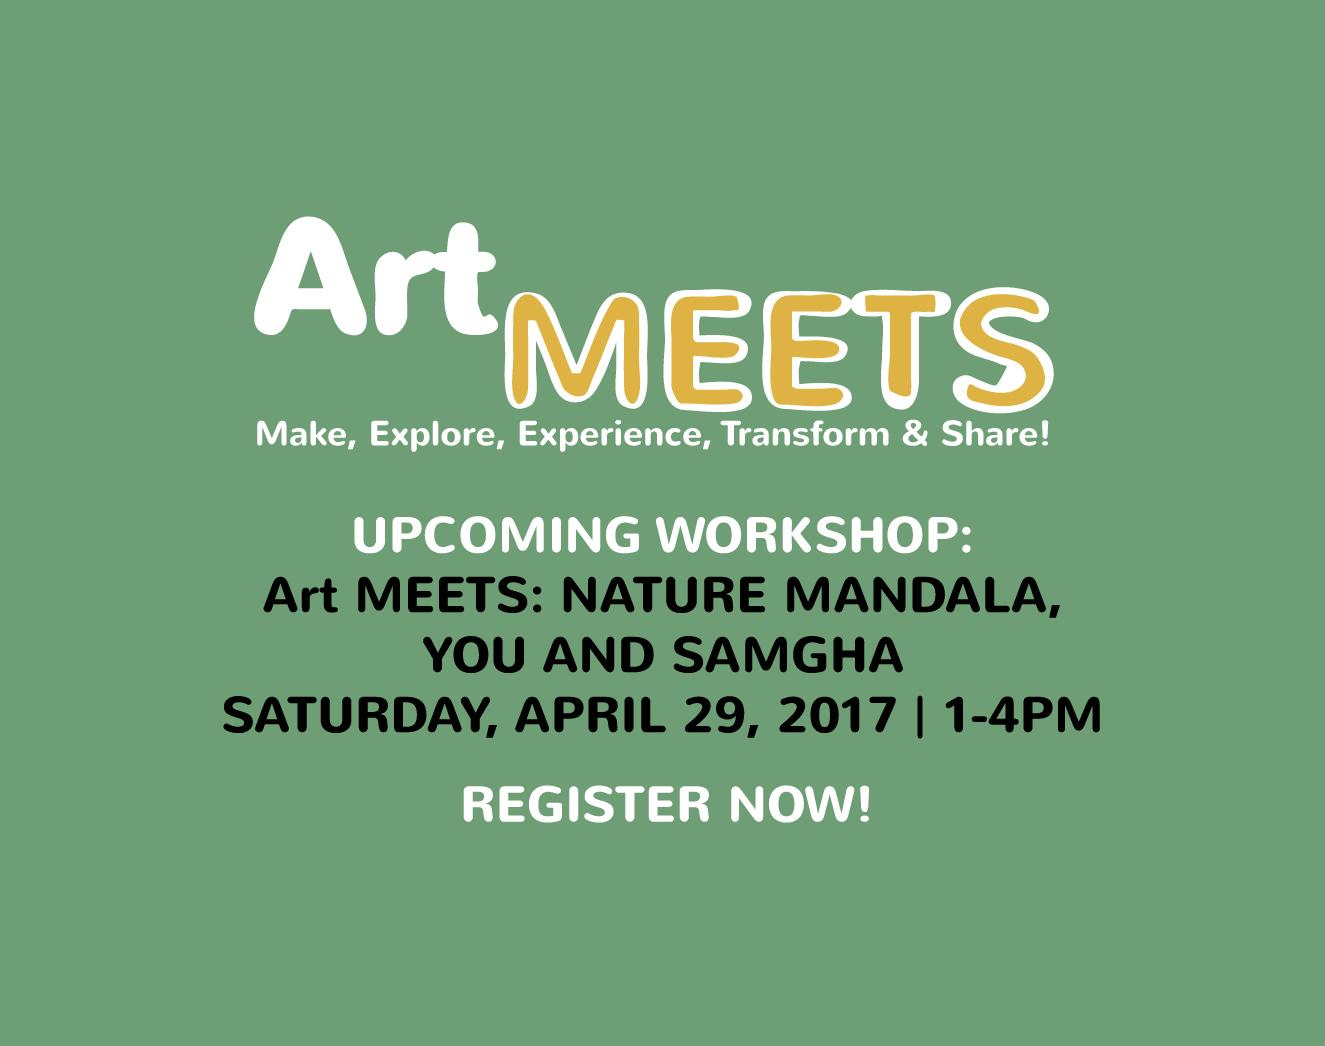 Art MEETS: Nature Mandala, You & Samgha